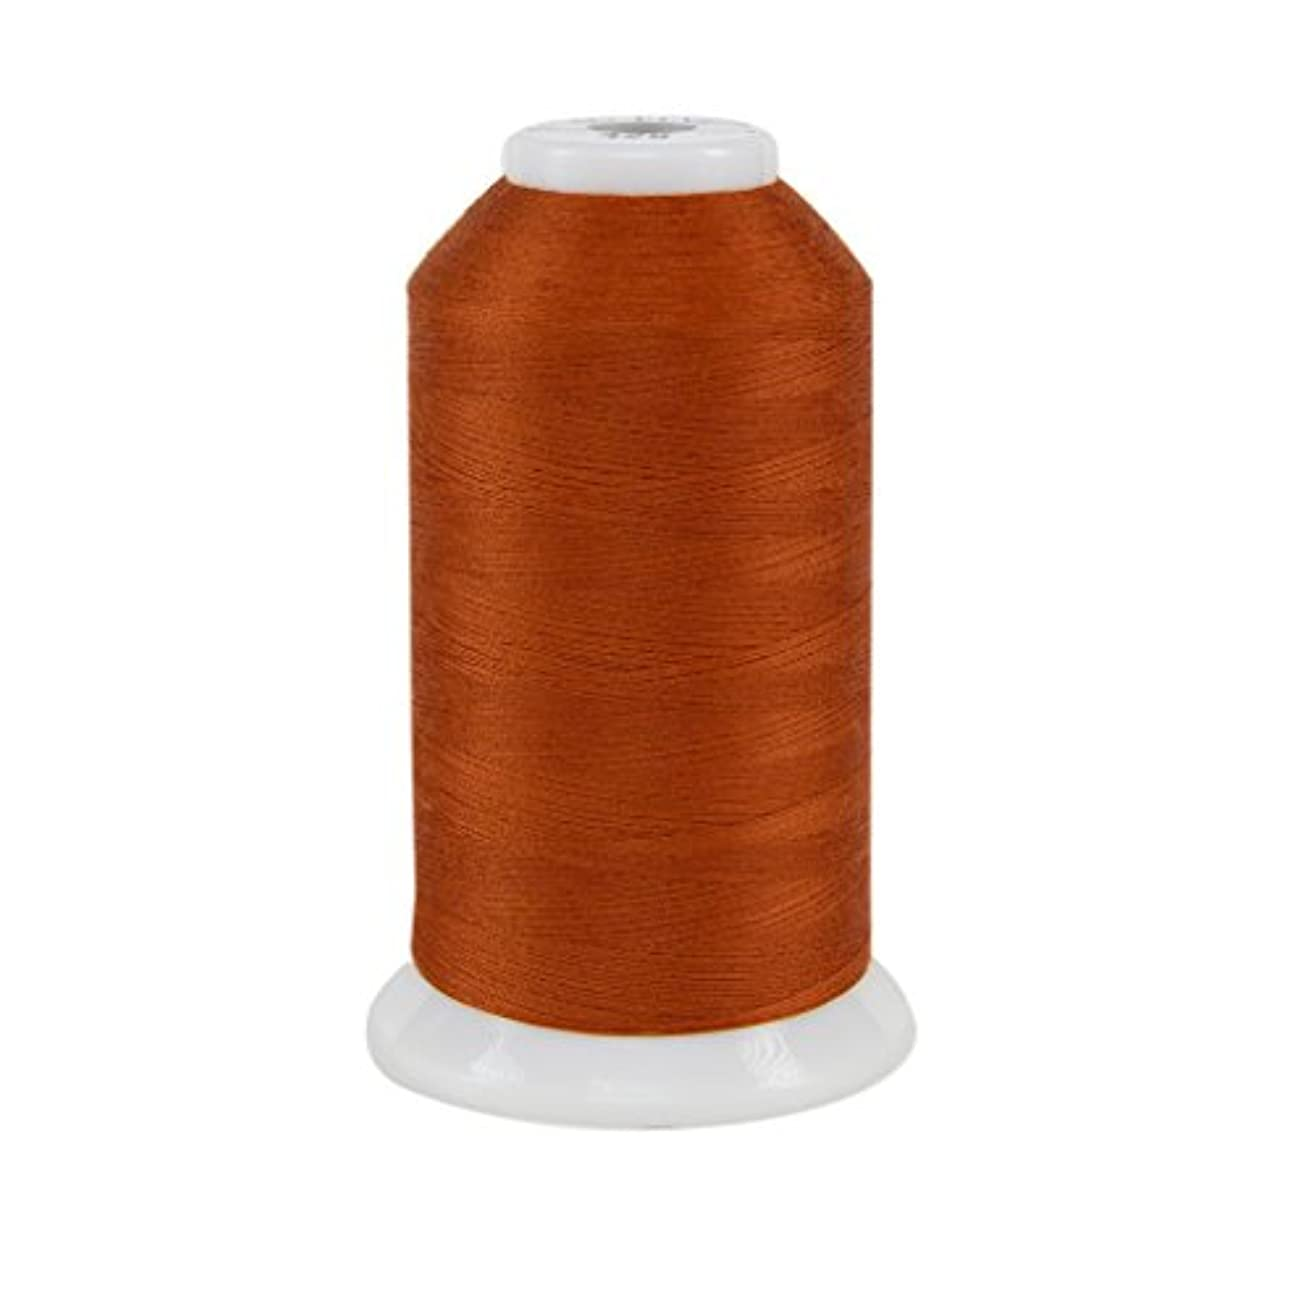 Superior Threads 11602-429 So Fine Pumpkin 3-Ply 50W Polyester Thread, 3280 yd